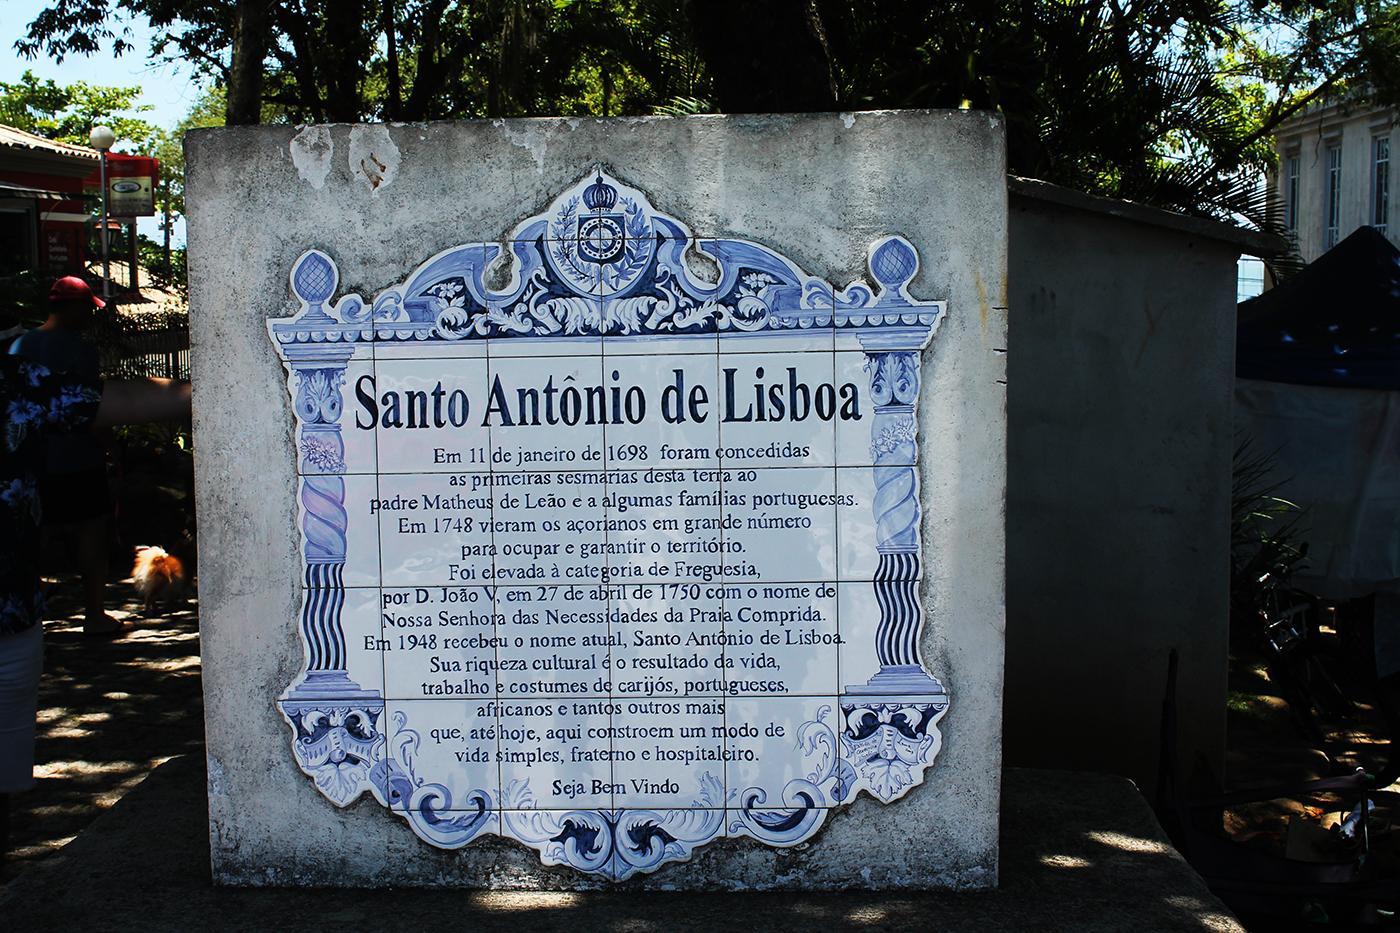 Santo Antônio de Lisboa - Manu Fernandes